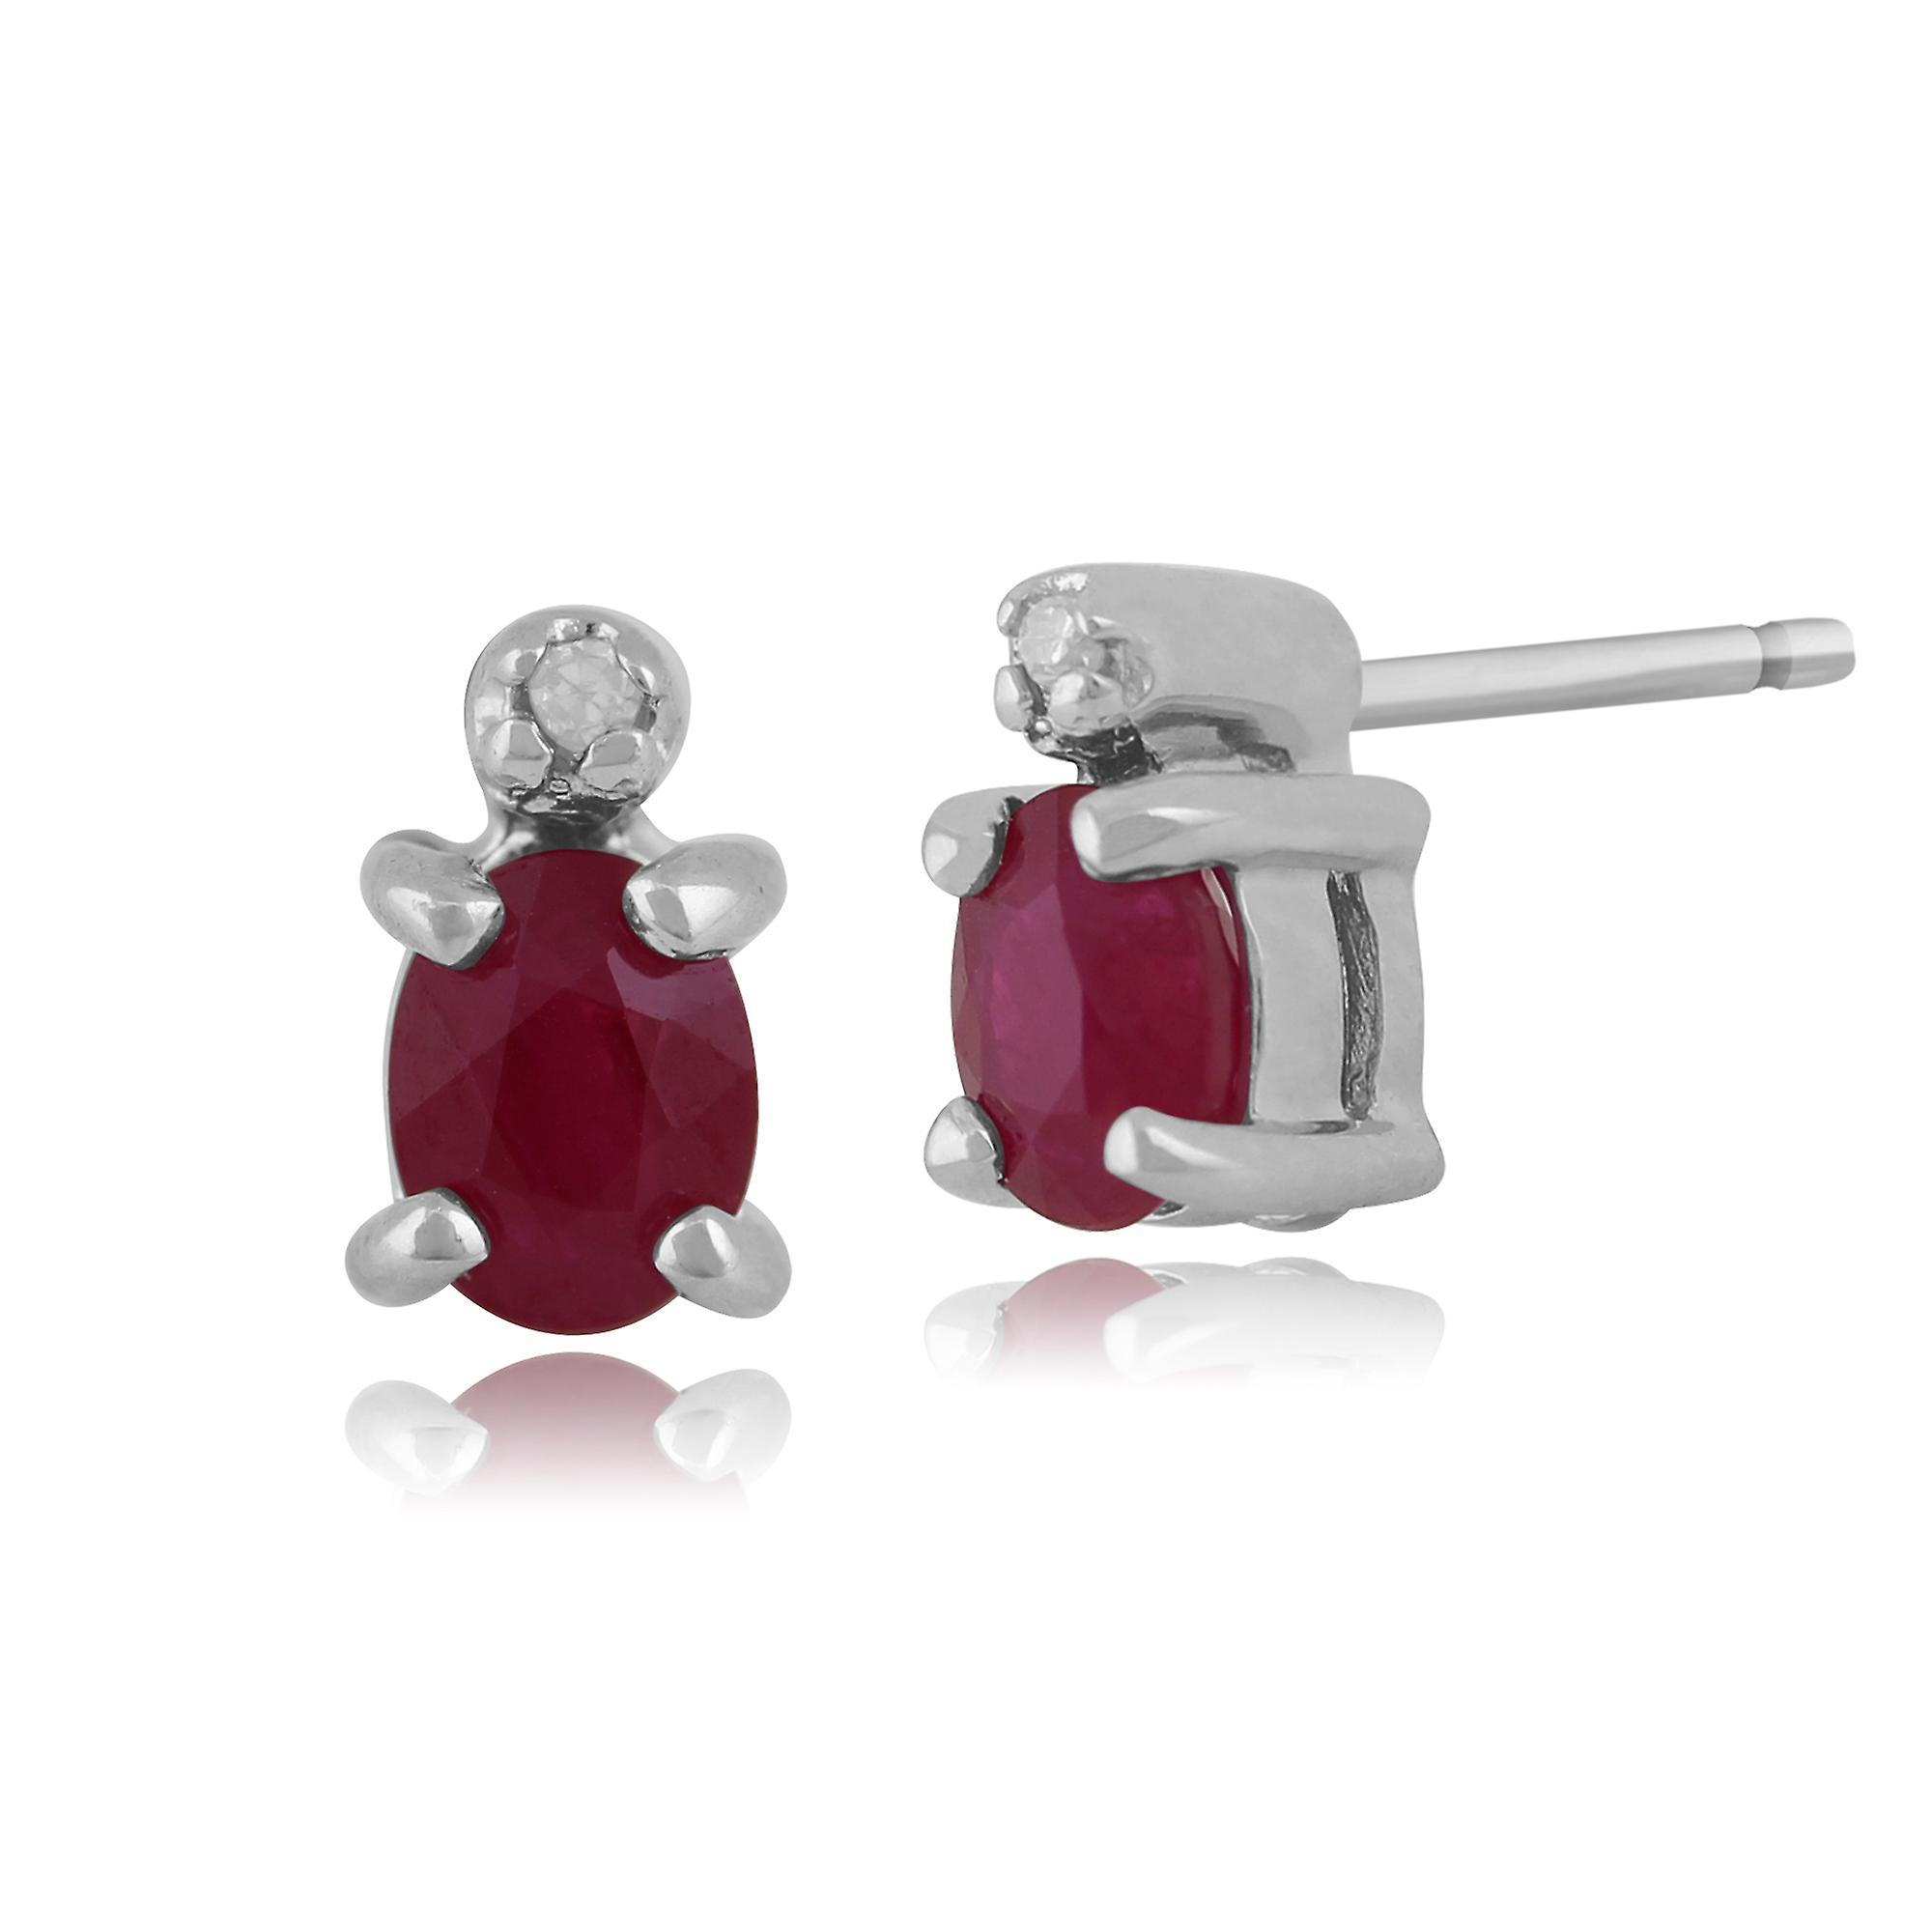 Gemondo 9ct White Gold Ruby & Diamond Stud Earrings & 45cm Necklace Set